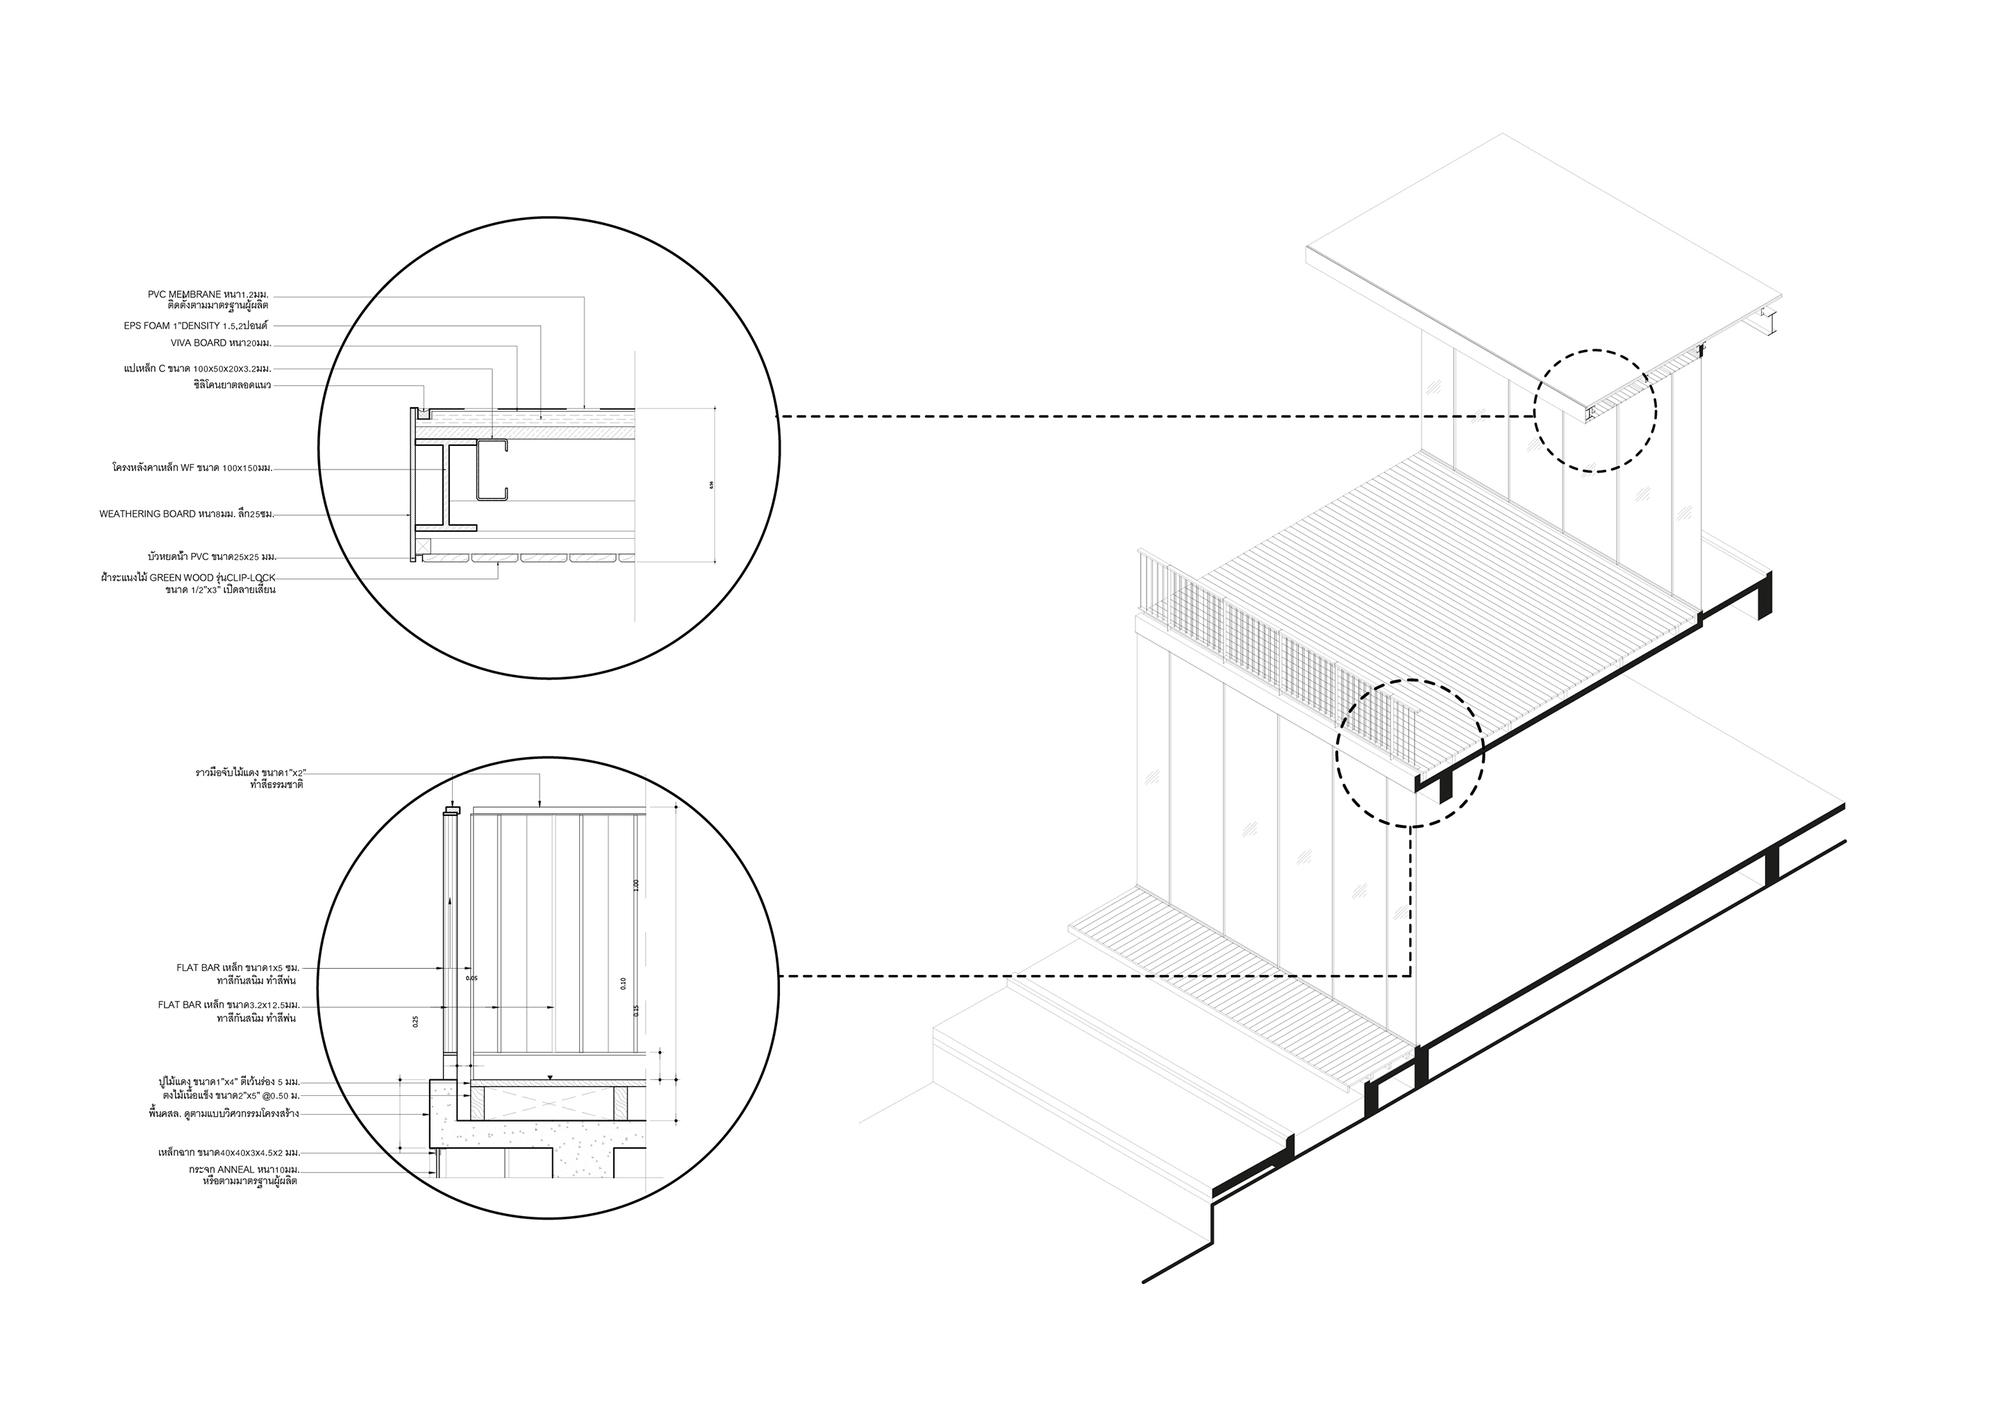 2000x1414 Gallery Of Kurve 7 Studo Architects